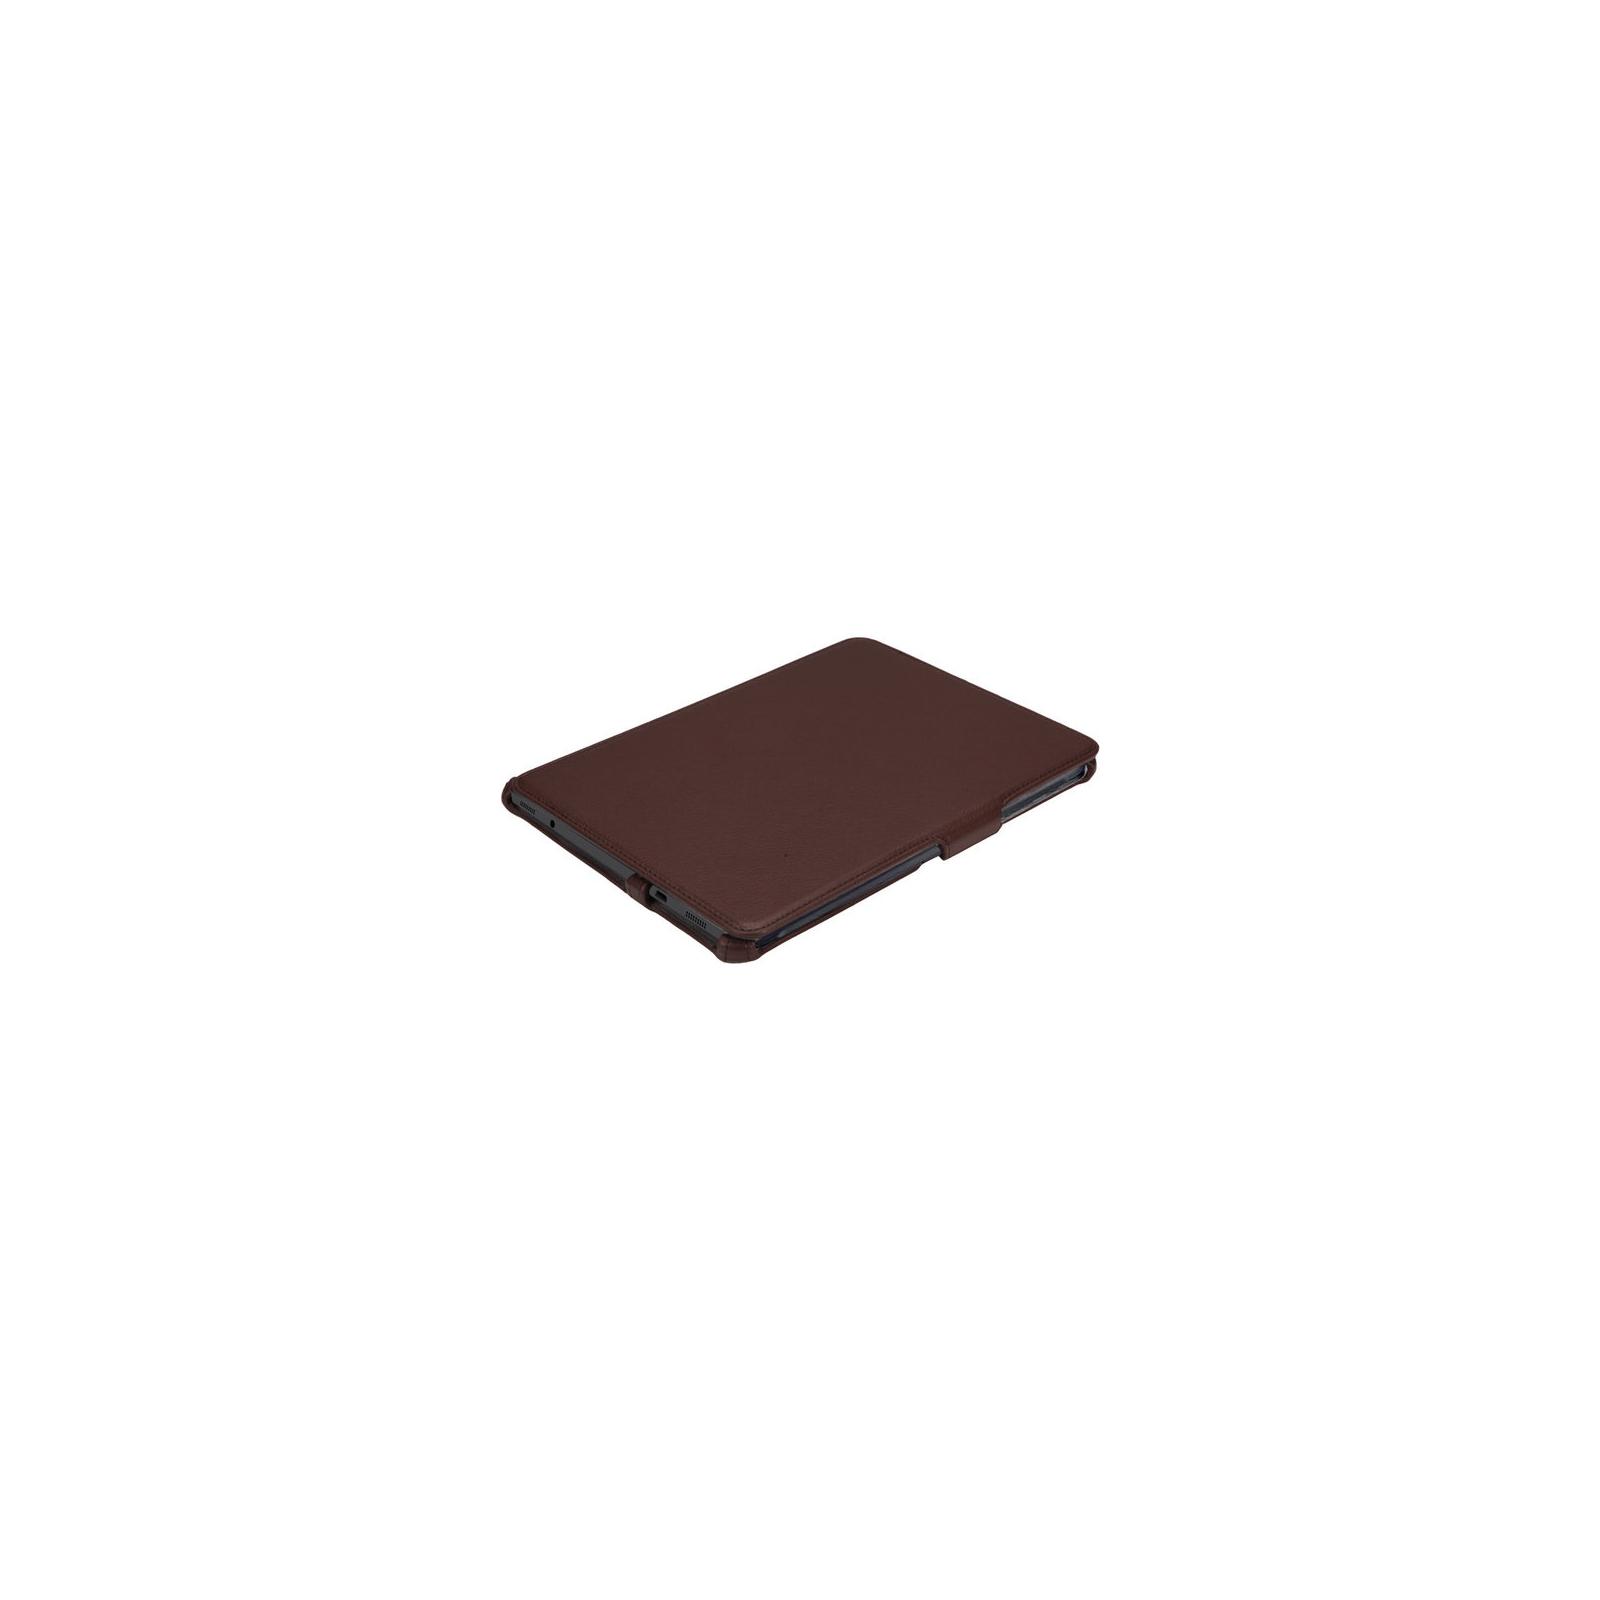 Чехол для планшета AirOn для Samsung Galaxy Tab S 2 8.0 brown (4822352778521) изображение 3